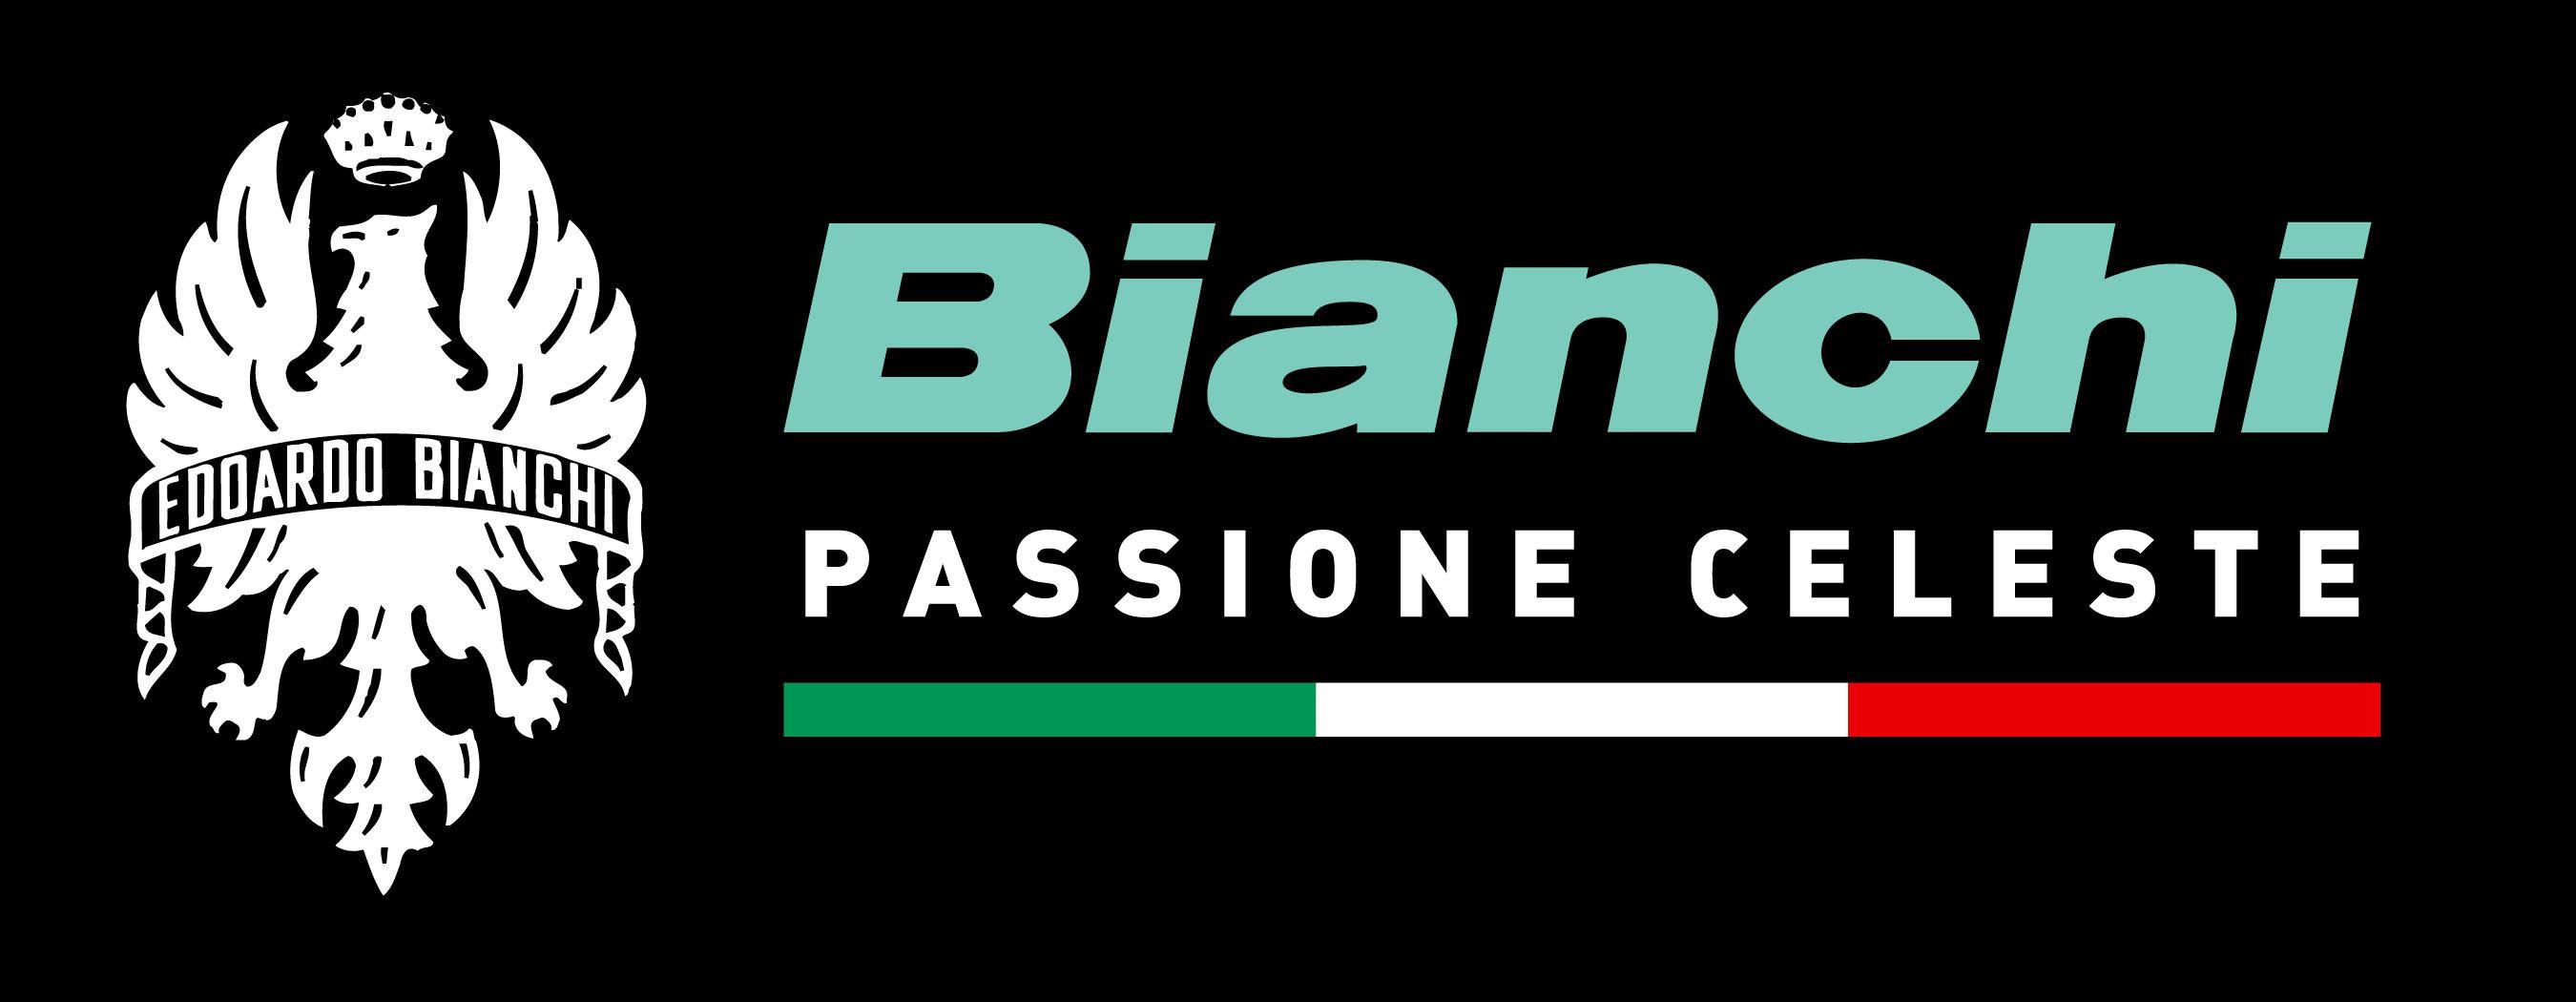 Team Bianchi Press Release C1460130280e4c7b112f1b5282896e55